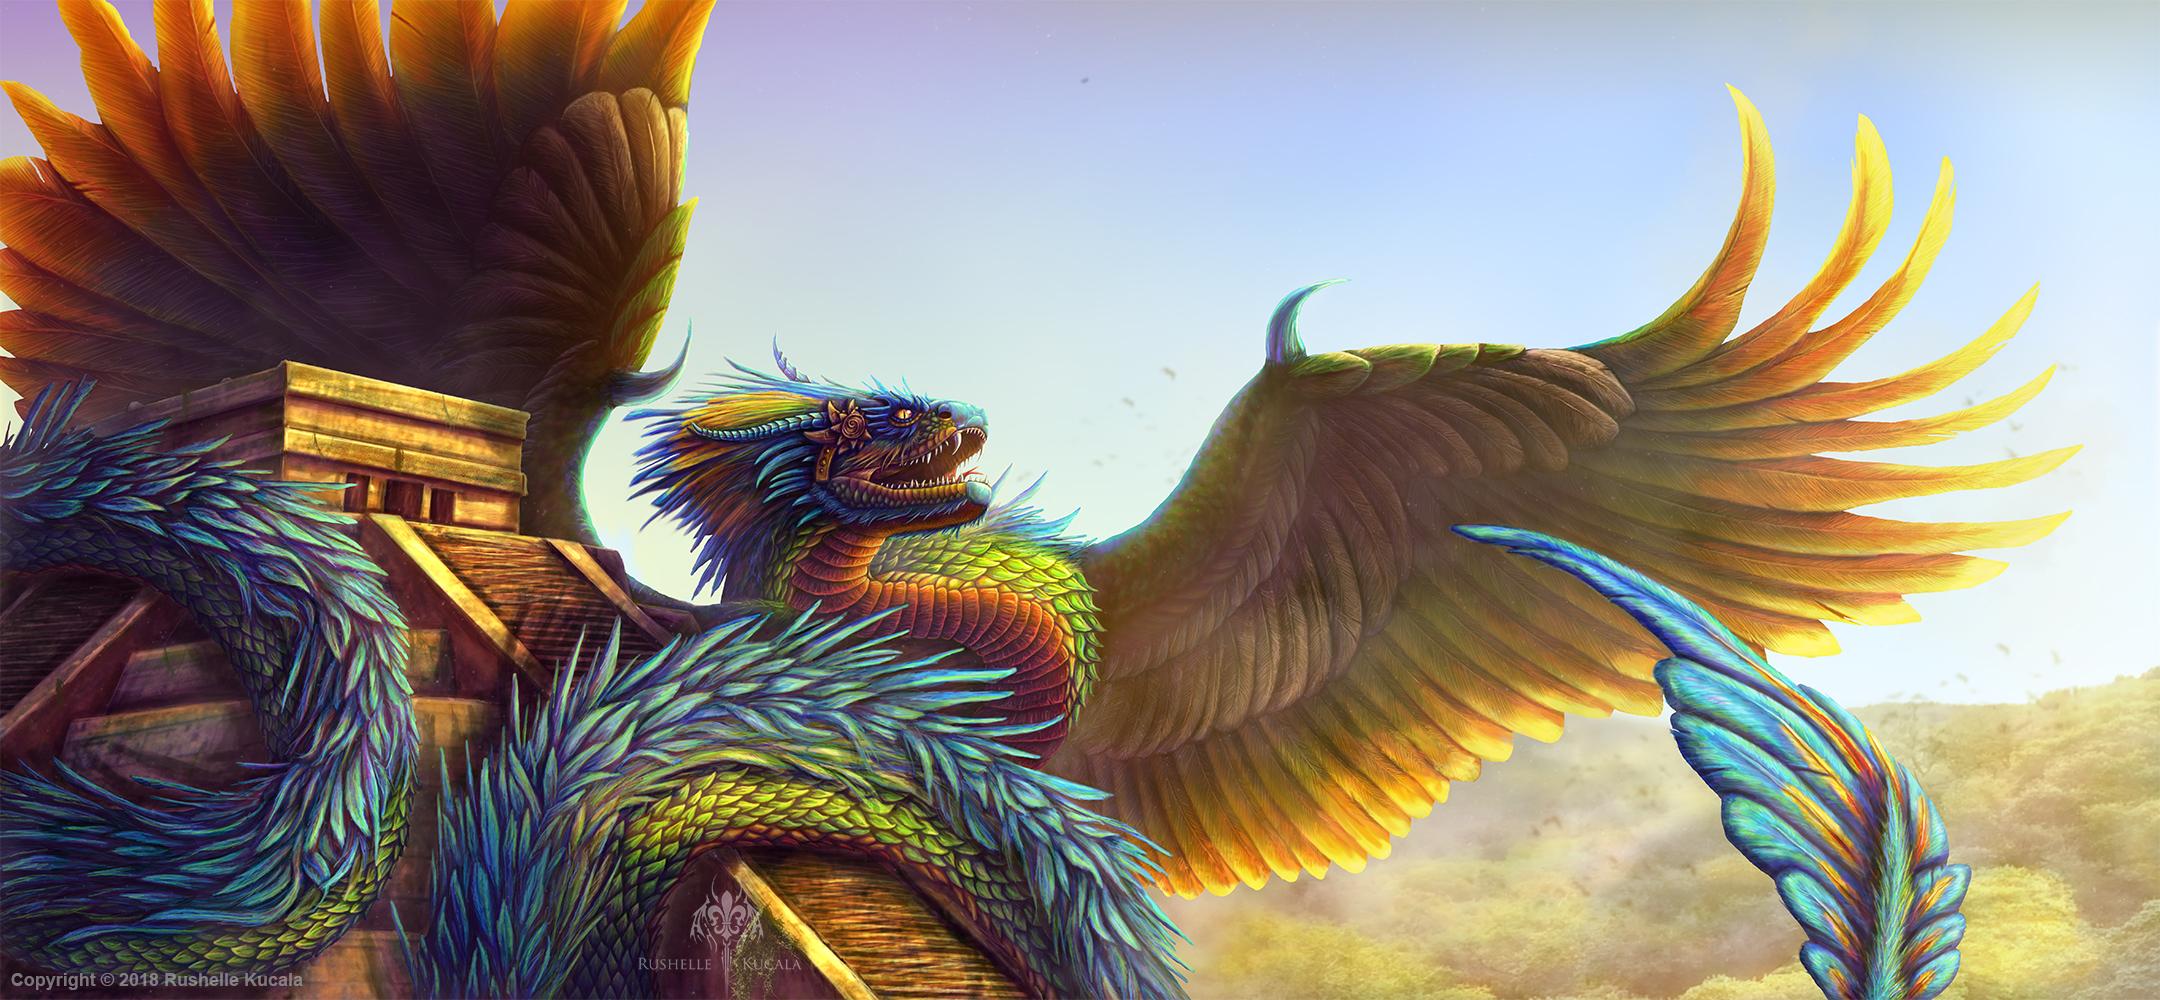 Quetzalcoatl 2018 by TheDragonofDoom